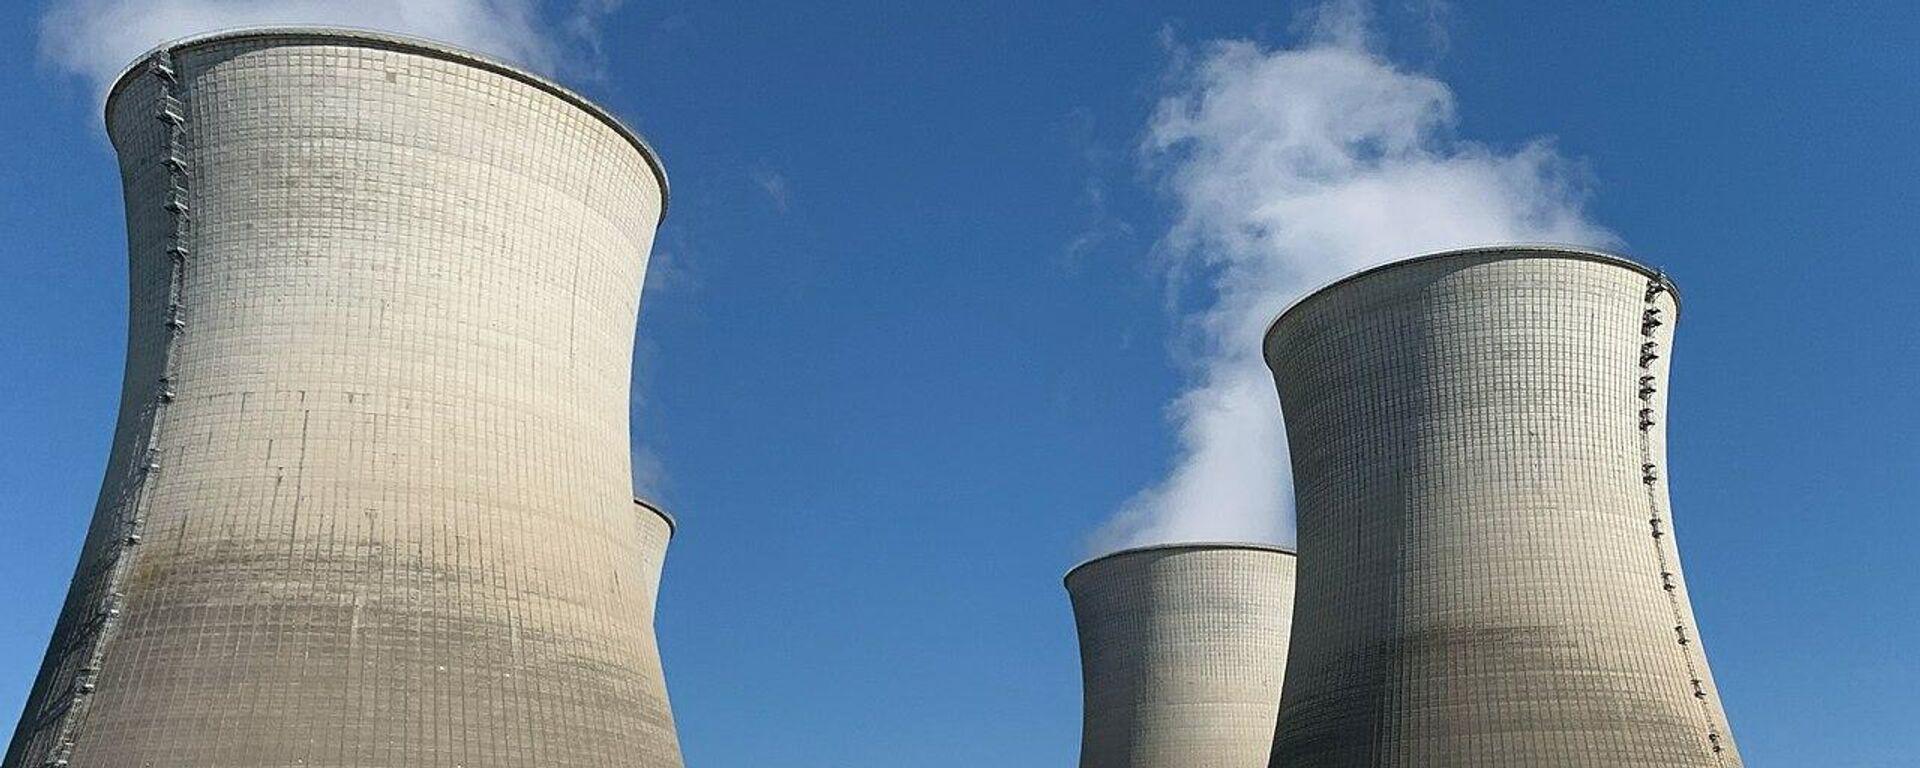 Atomkraftwerk (Archivbild) - SNA, 1920, 27.03.2021